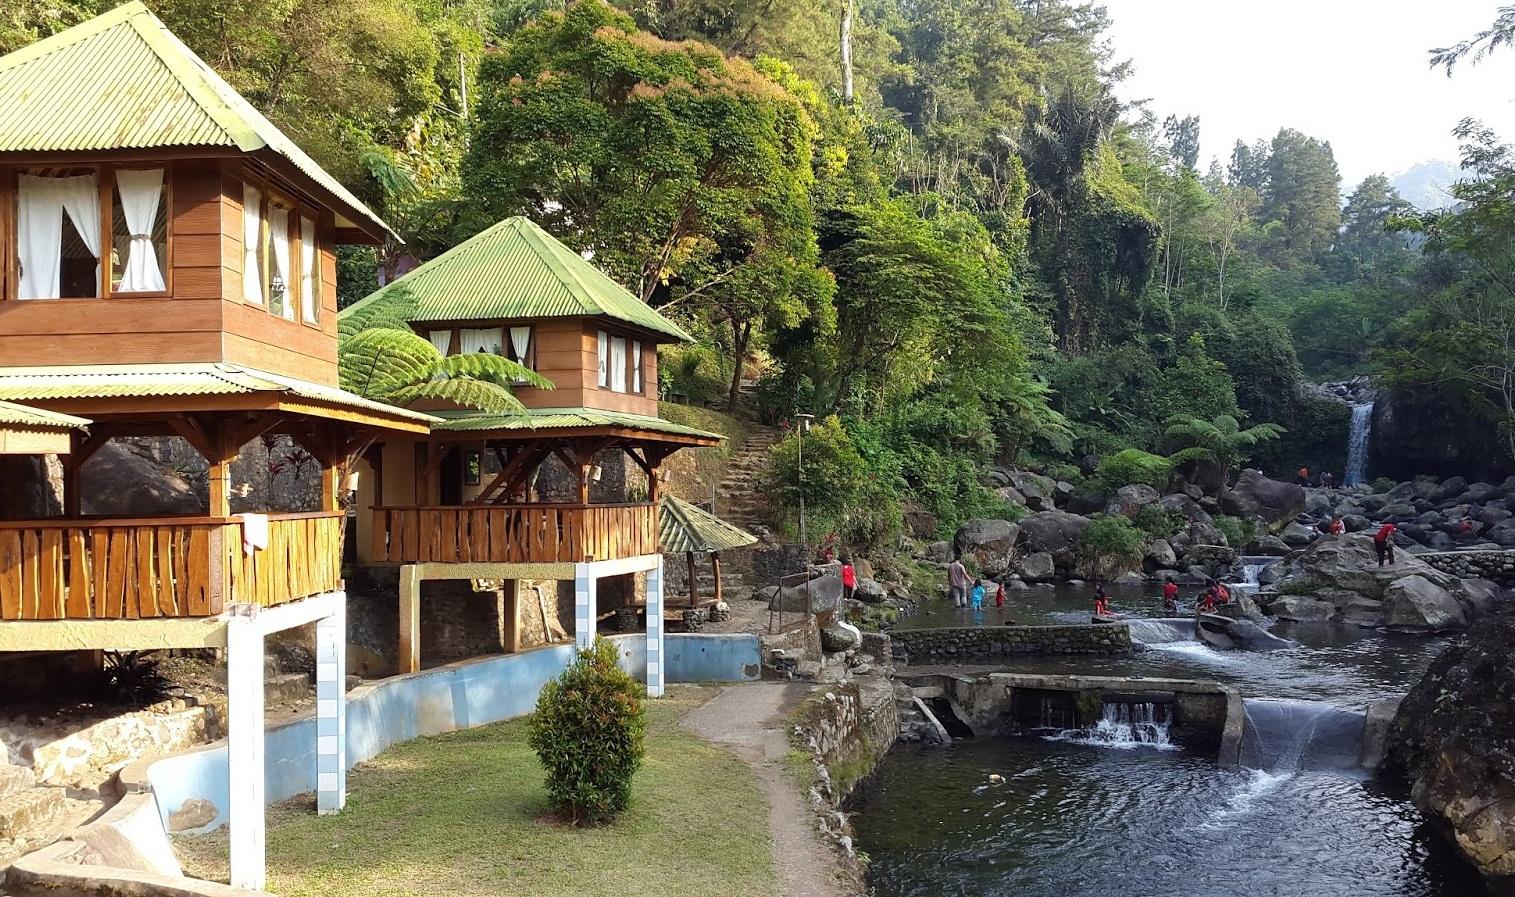 Wisata Curug Gede Desa Ketenger Baturaden Banyumas Mandala Baturraden Kab